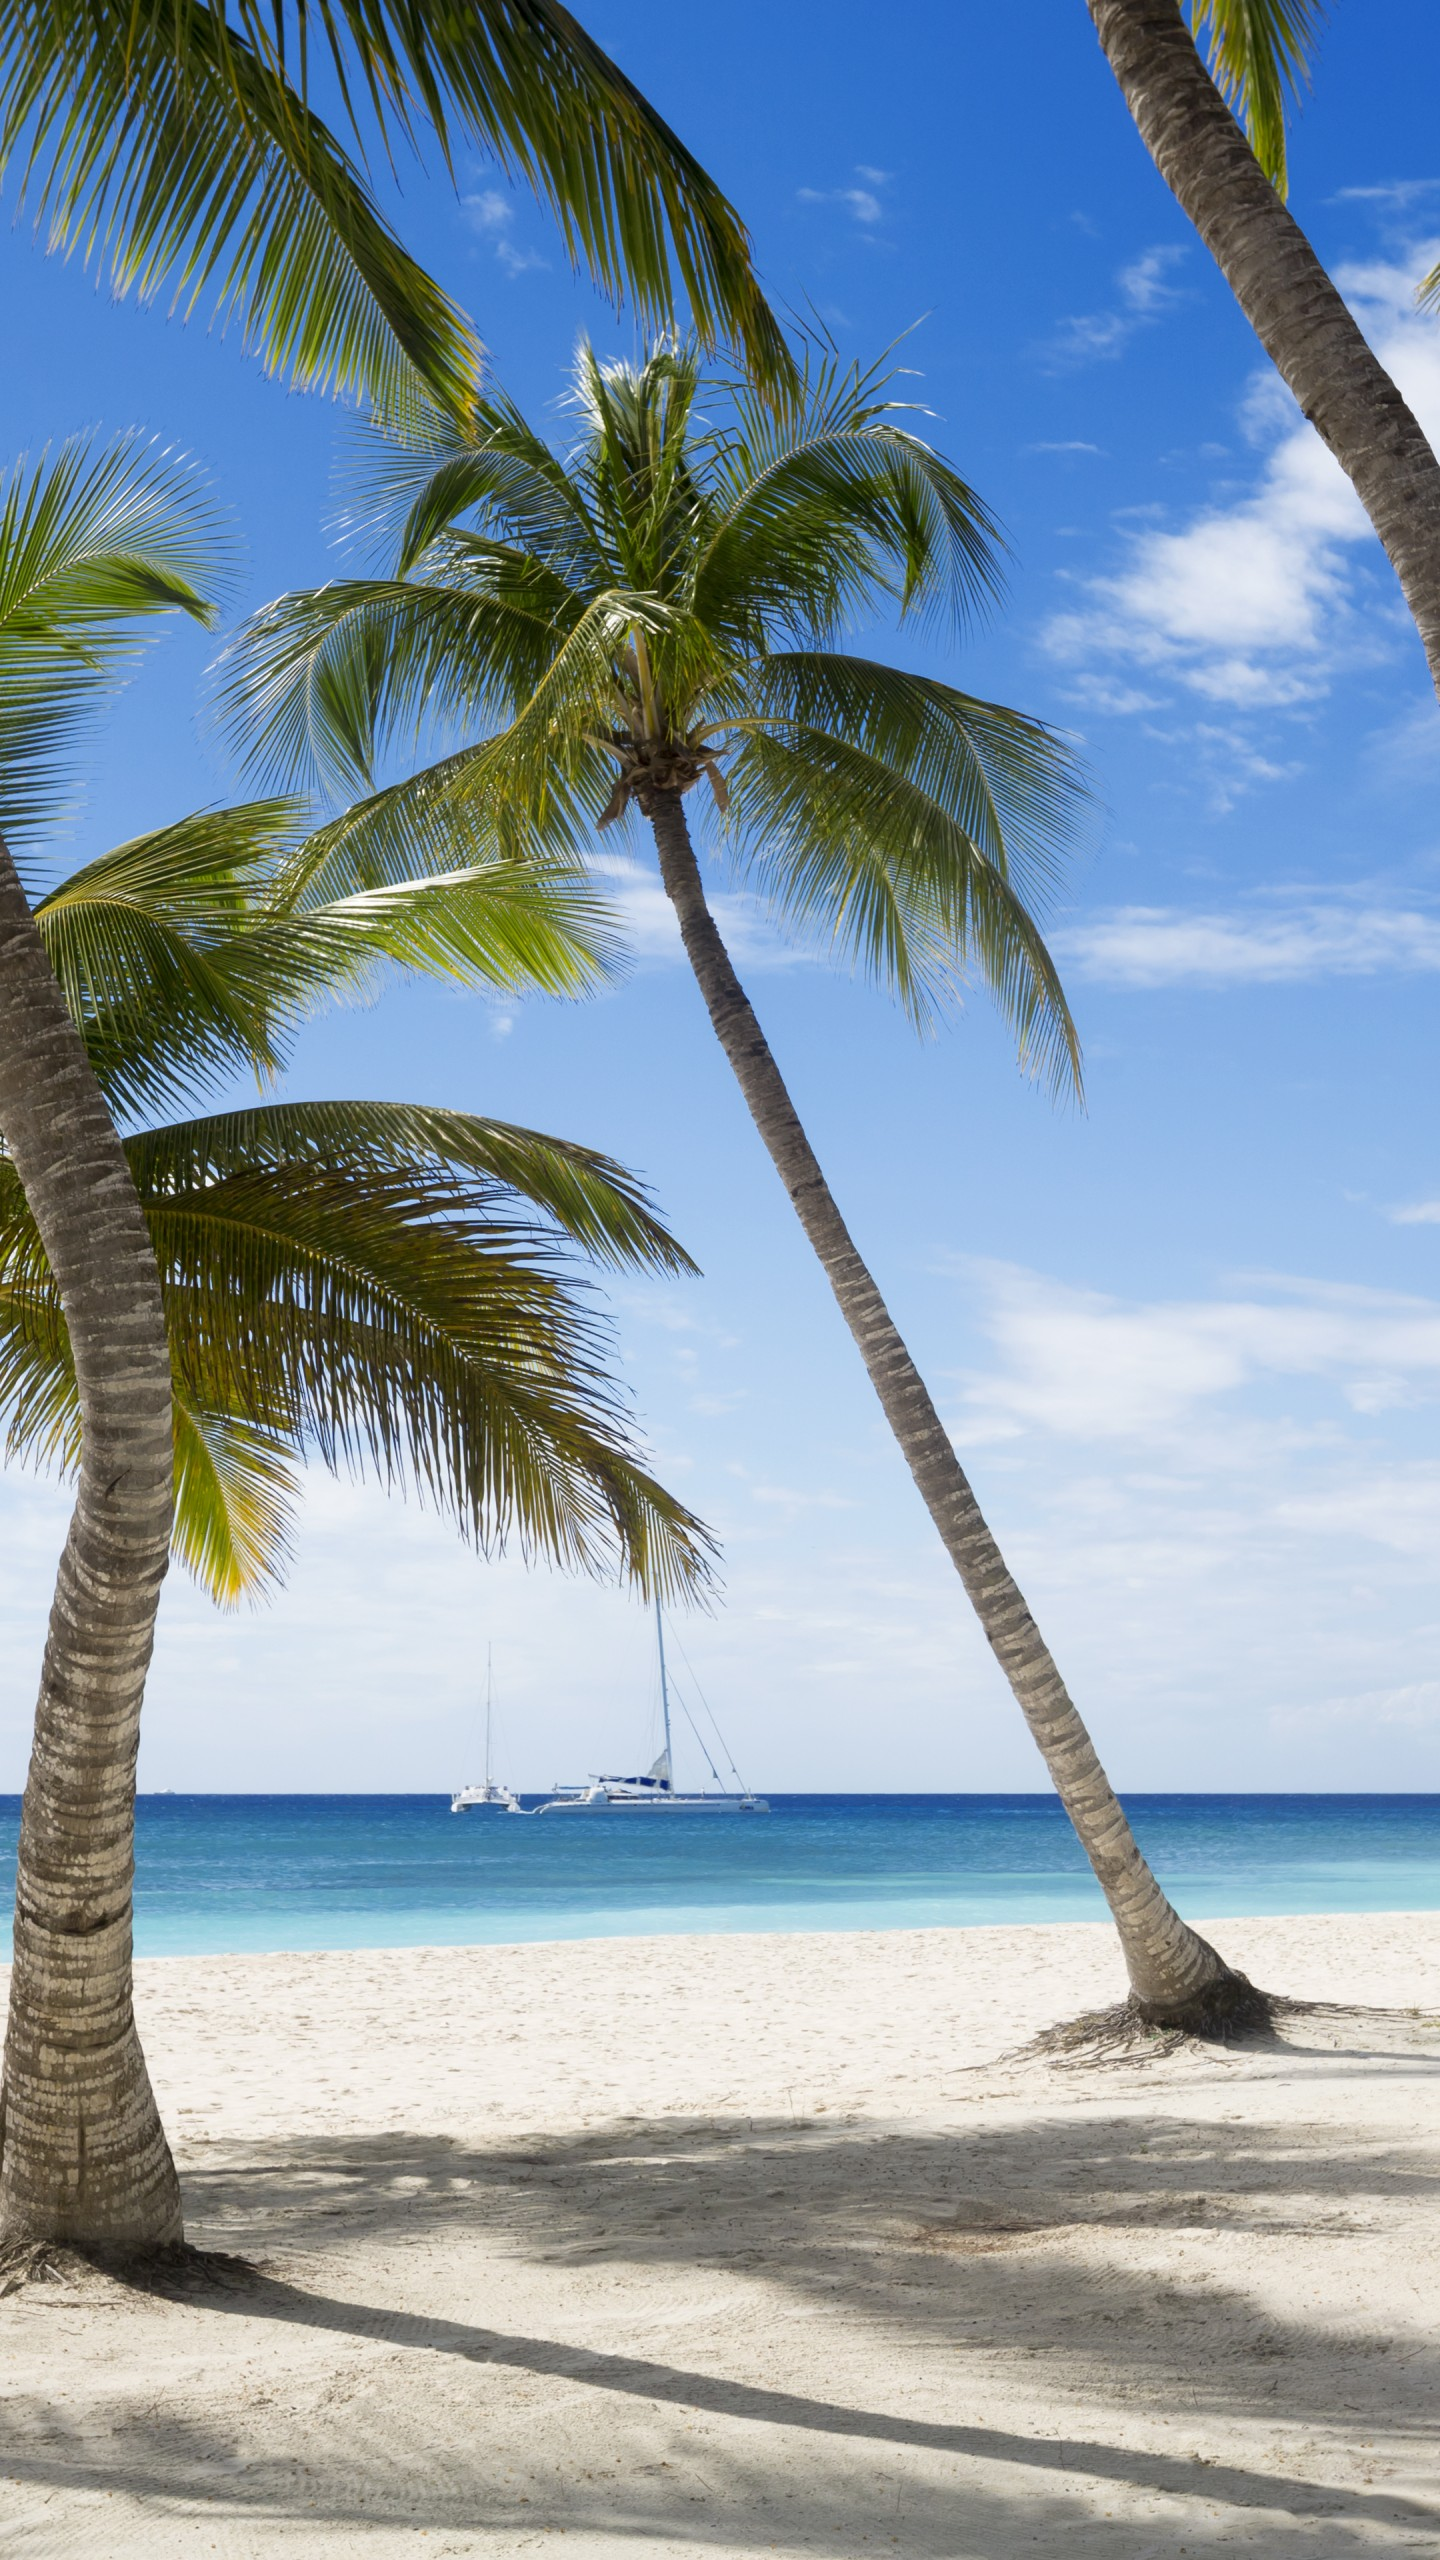 Wallpaper Jamaika 5k 4k Wallpaper The Caribbean Beach Palms Sky Travel Tourism Nature 6466